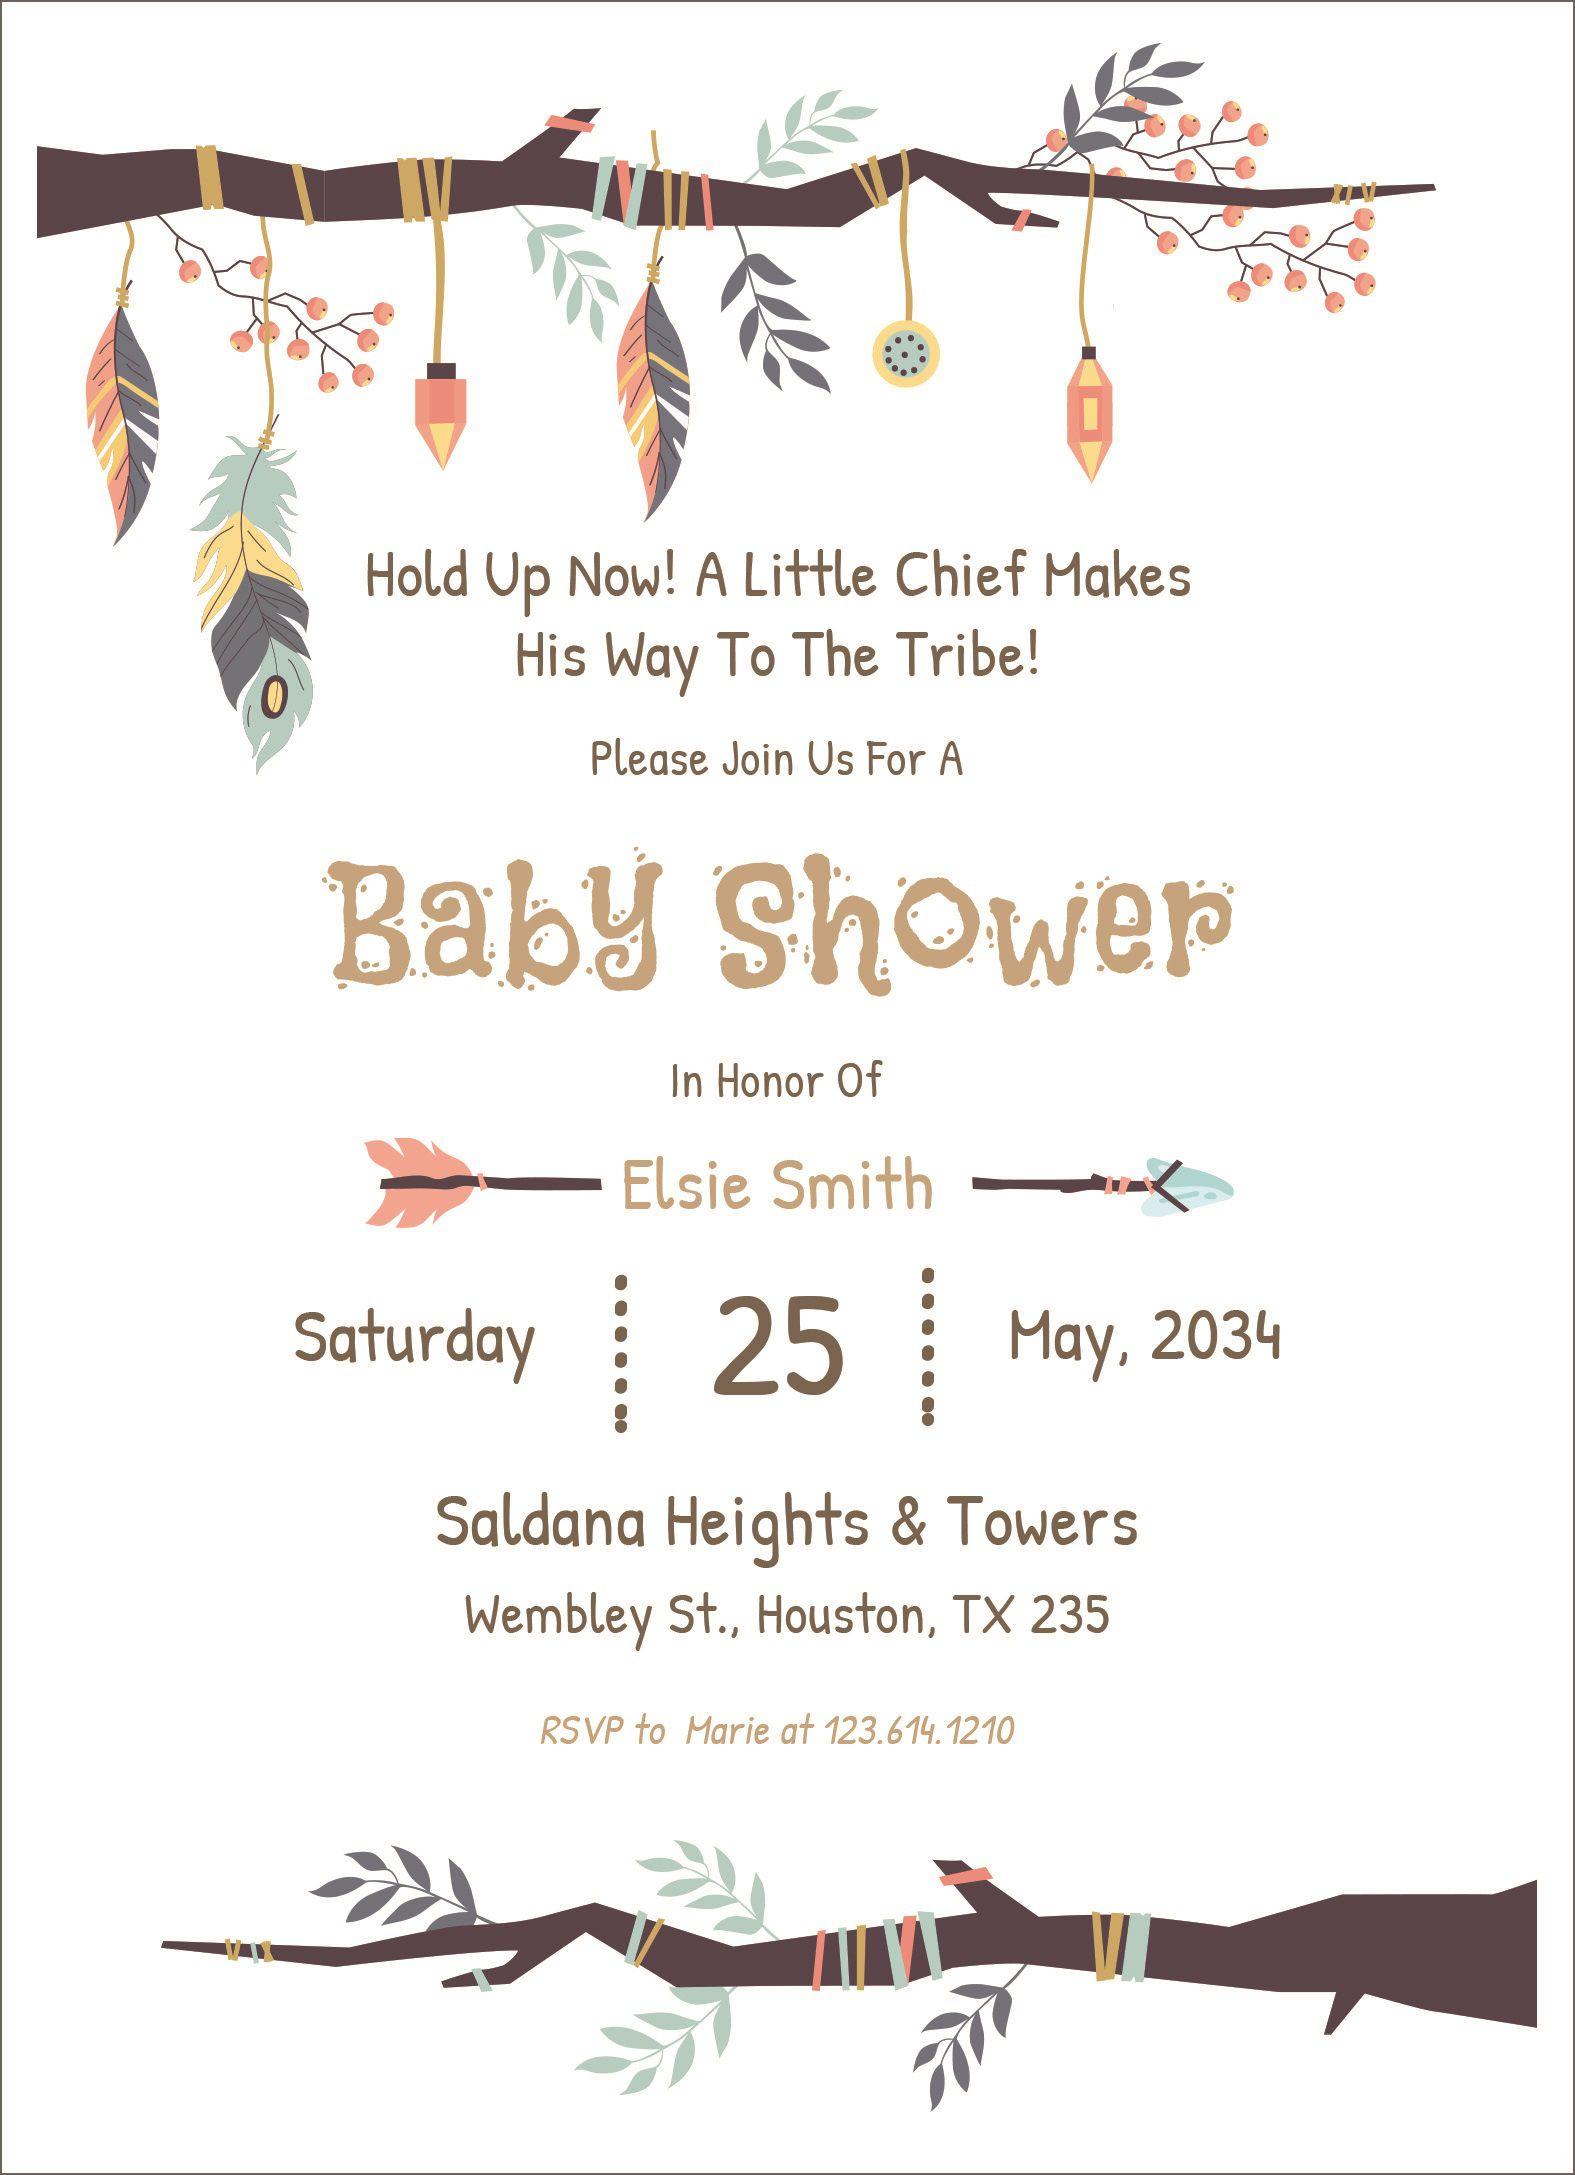 004 Rare Diy Baby Shower Invitation Template Highest Clarity  Templates Diaper FreeFull